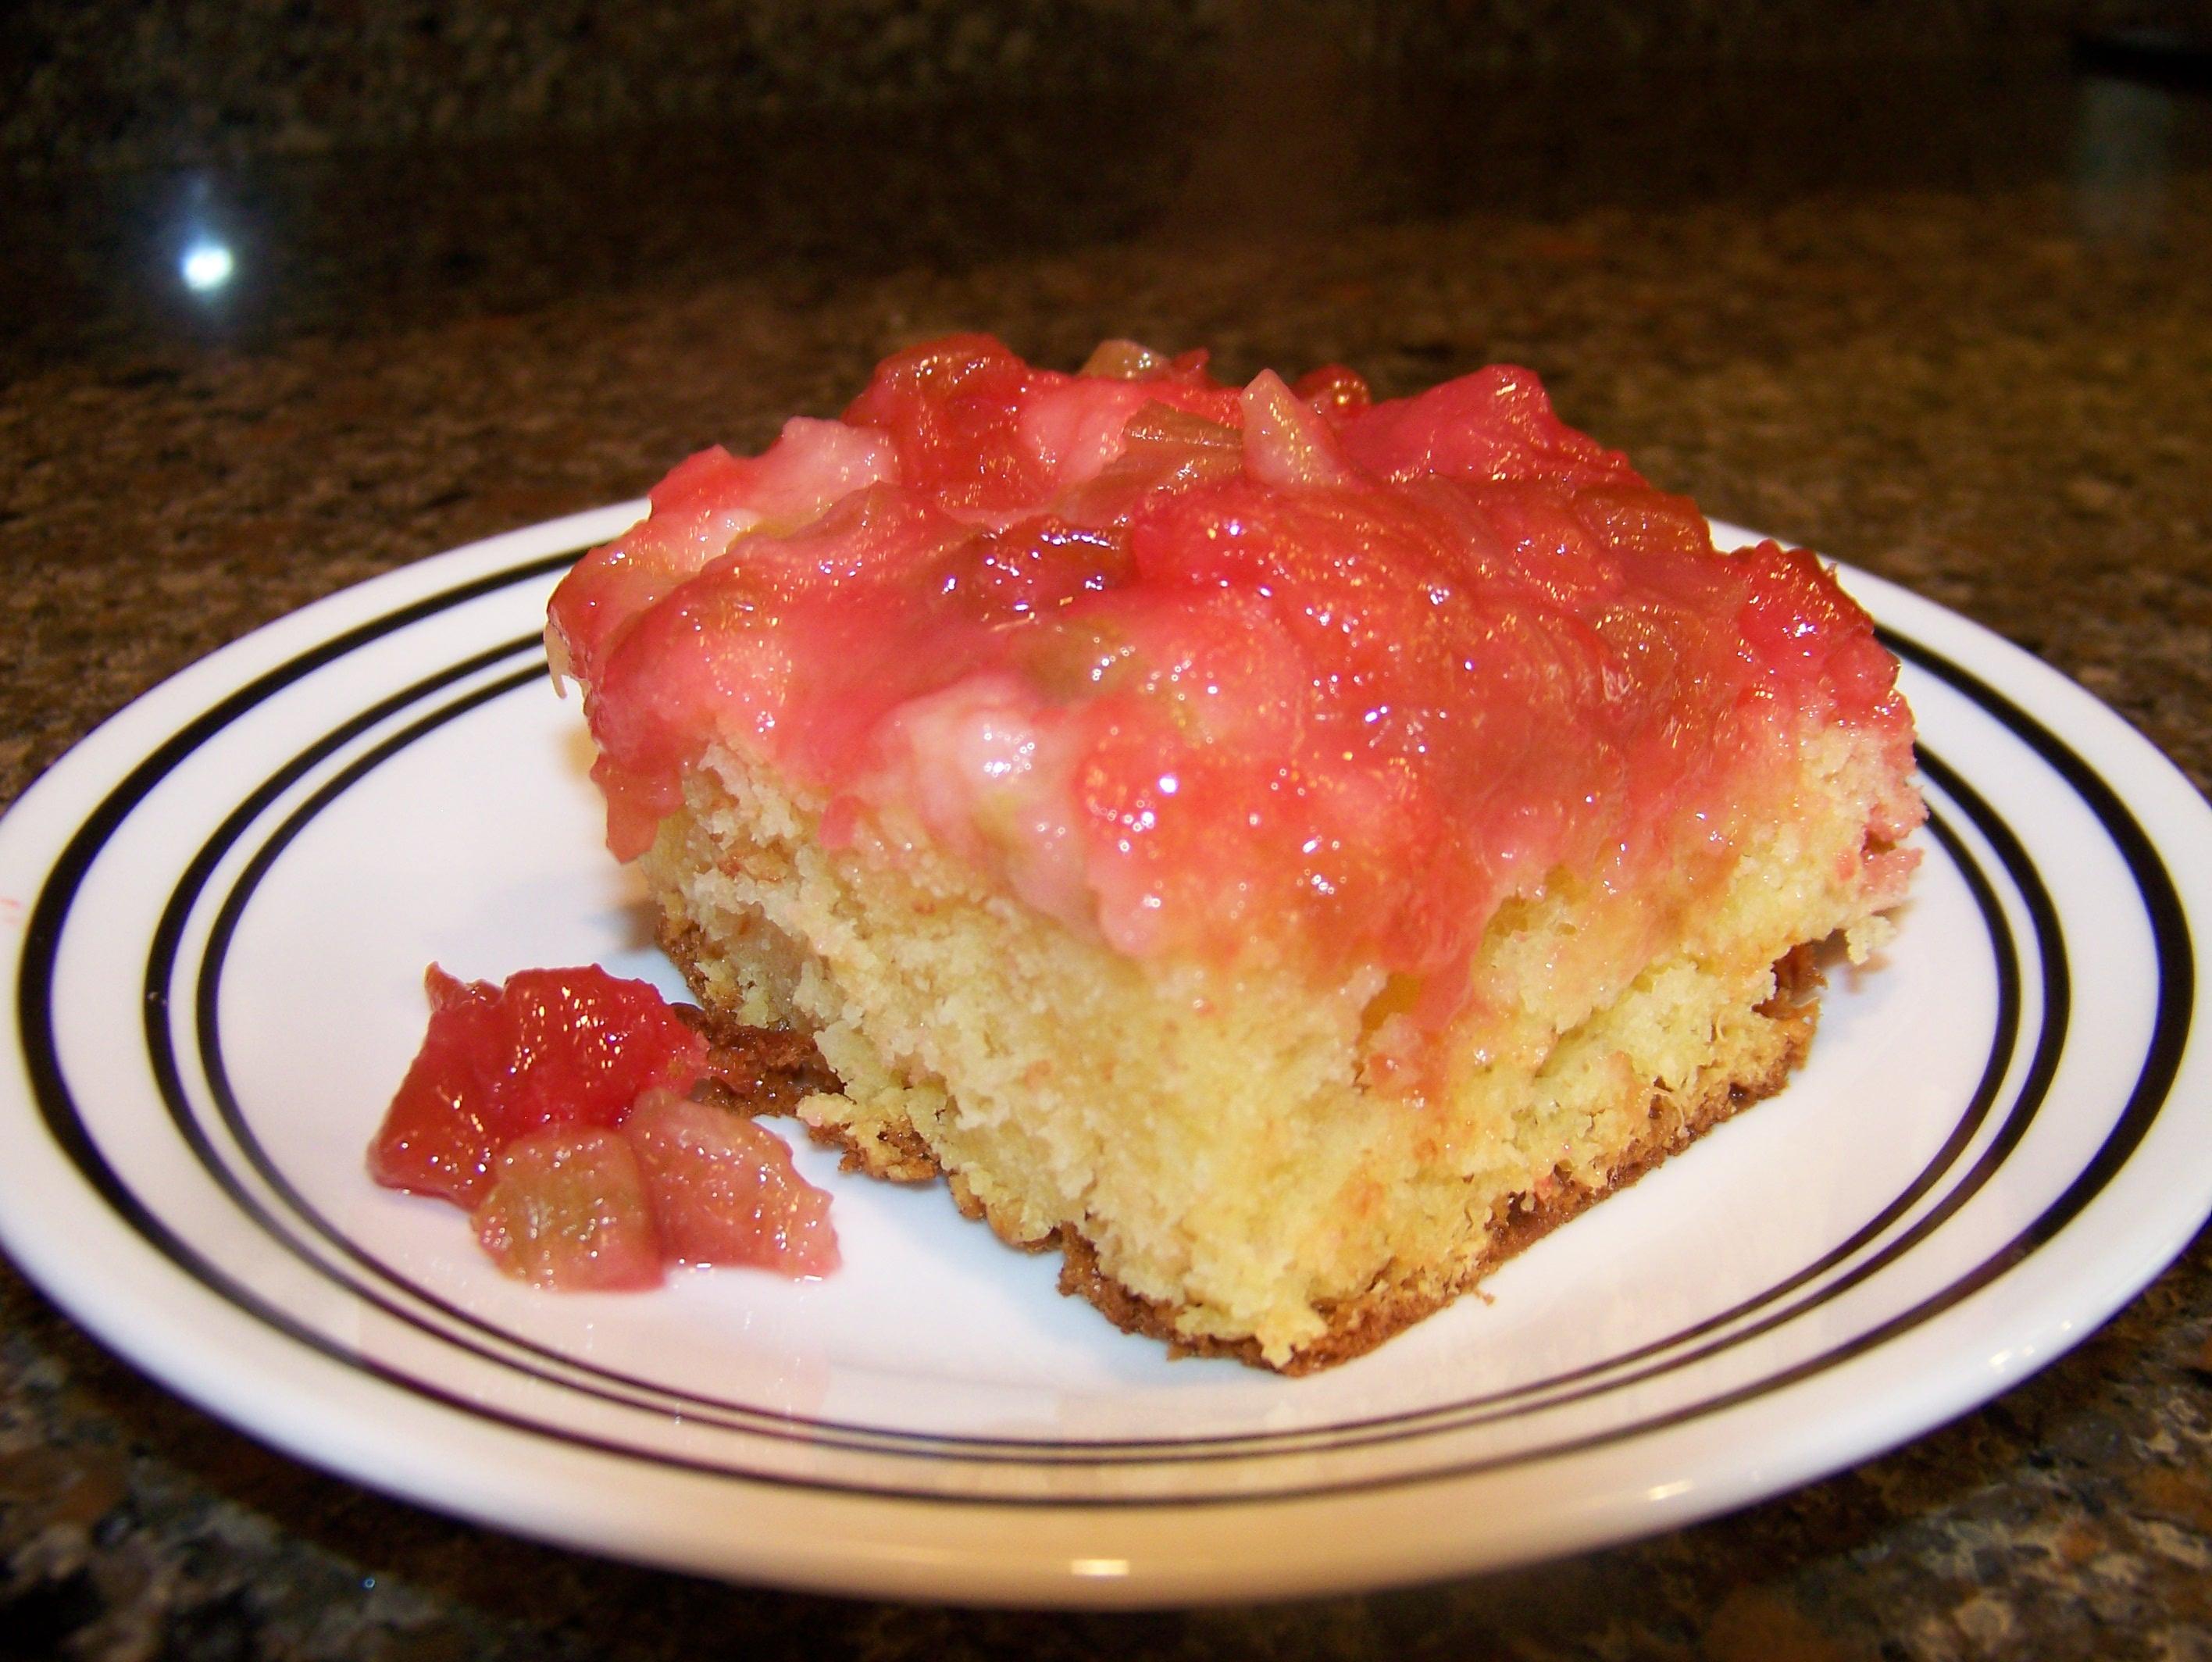 Upside down rhubarb cake recipes